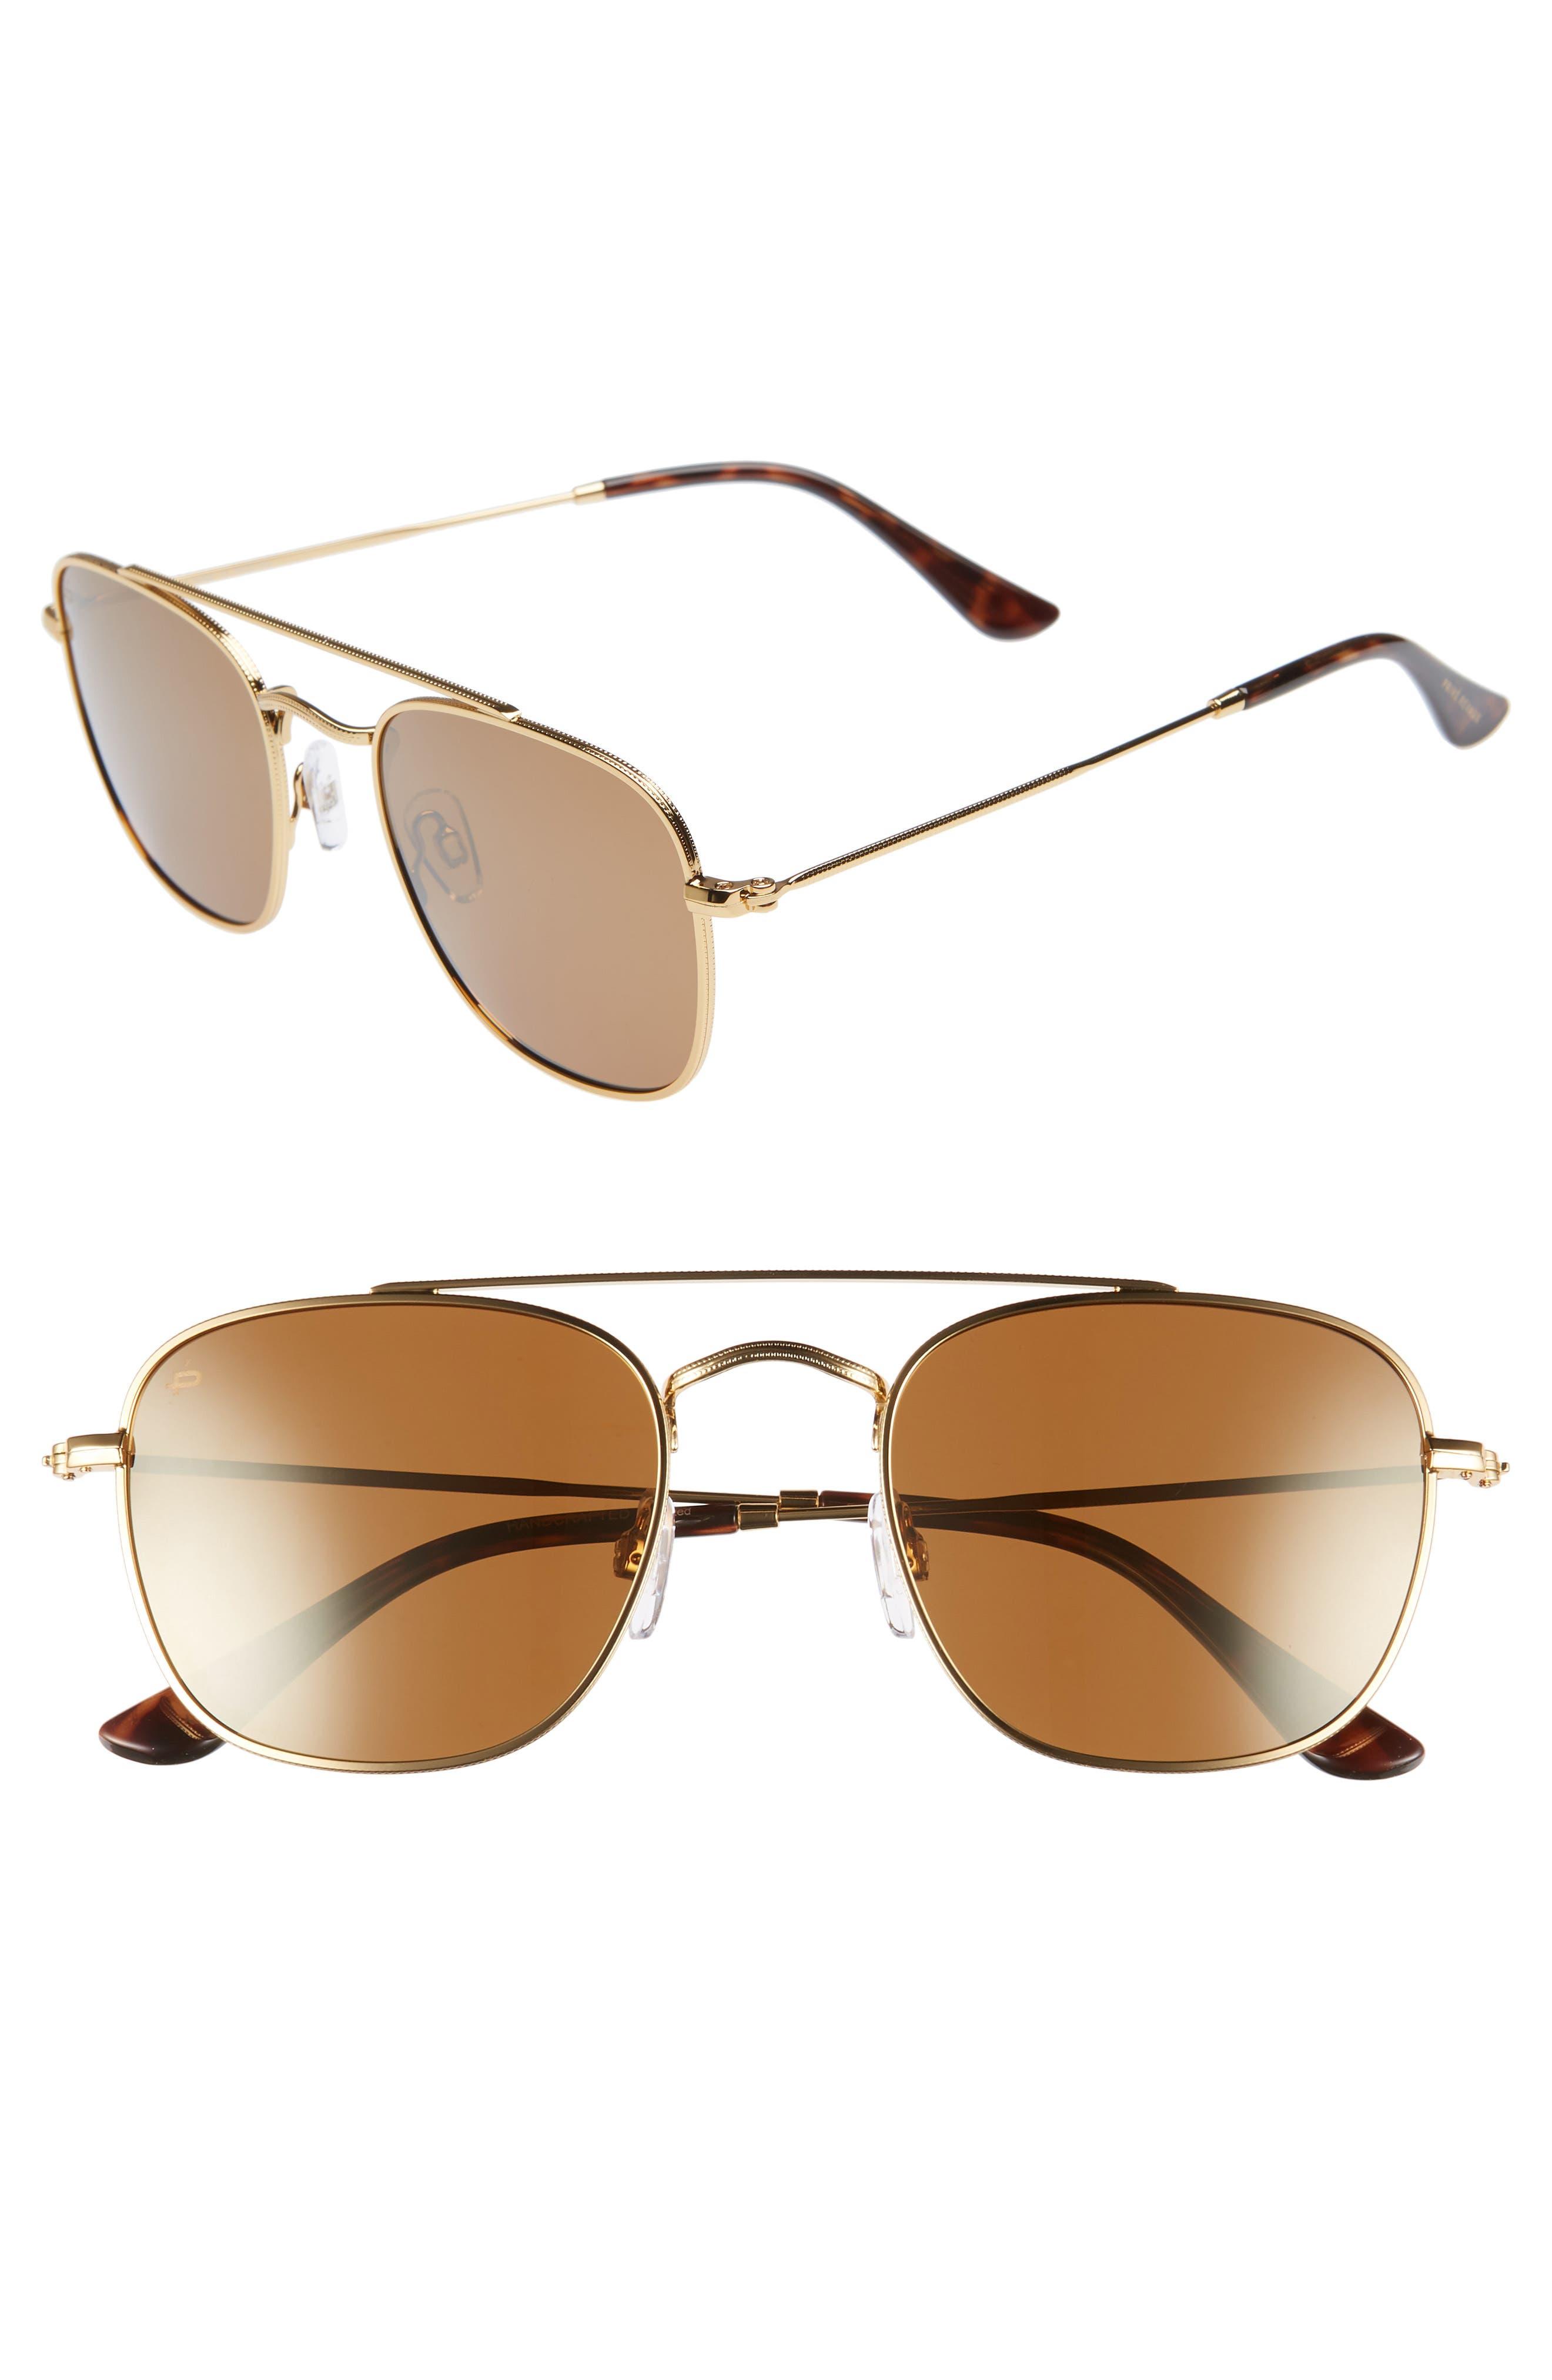 Privé Revaux The Yorker 54mm Sunglasses,                             Main thumbnail 1, color,                             HEAVY GOLD